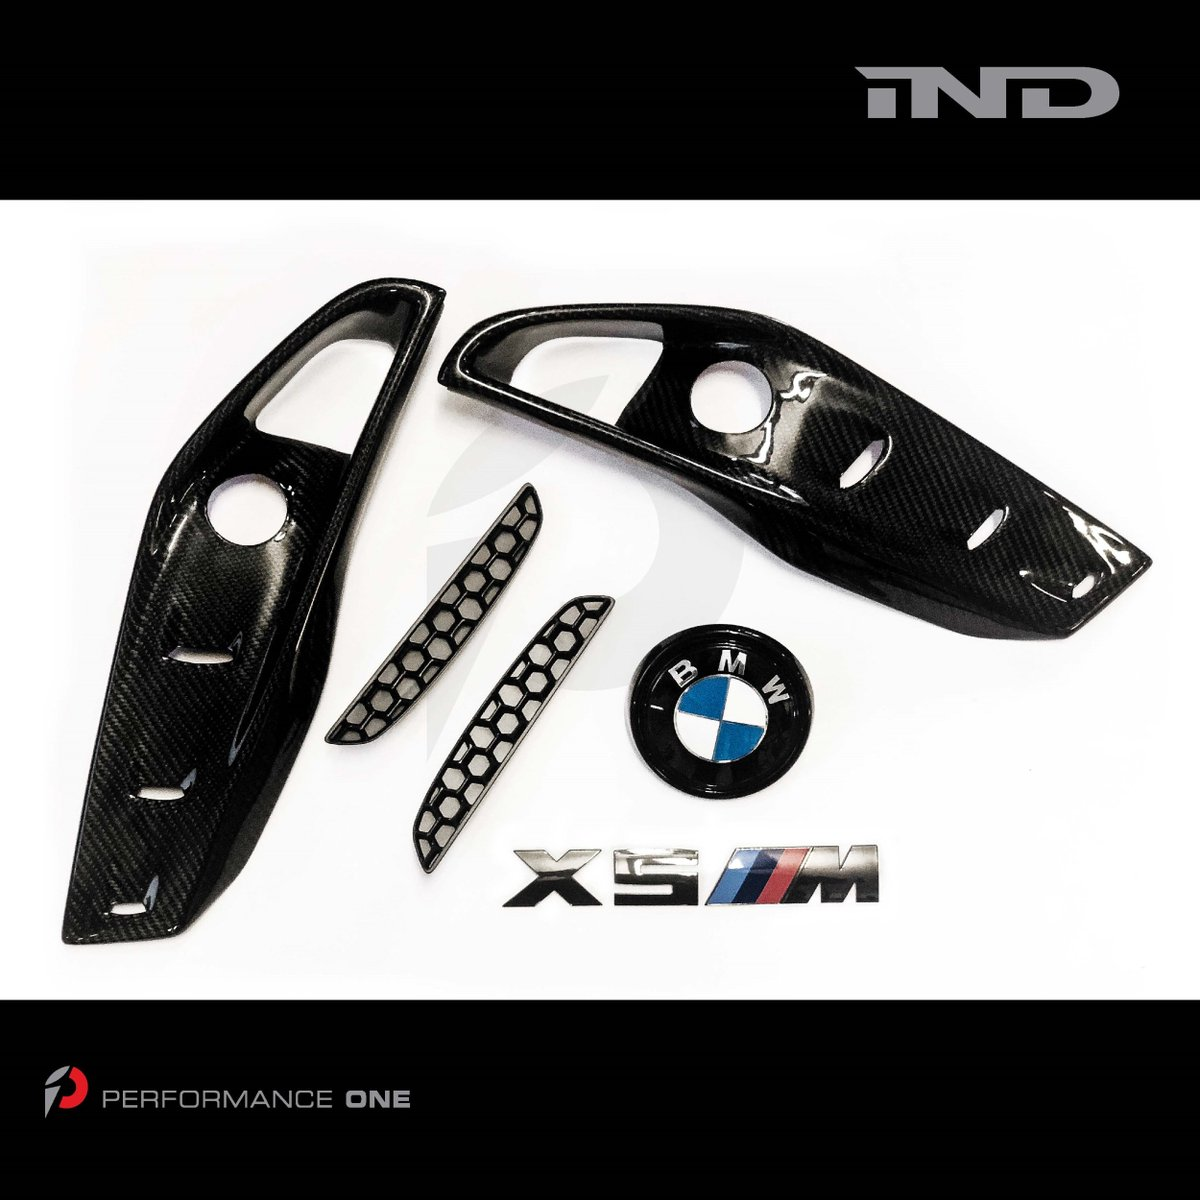 f85x5m hashtag on twitter BMW M4 Chrome rear reflector inserts in matteblack indstyle black chrome emblem glossblack trunk roundel rkp posites carbonfiber front bumper inserts